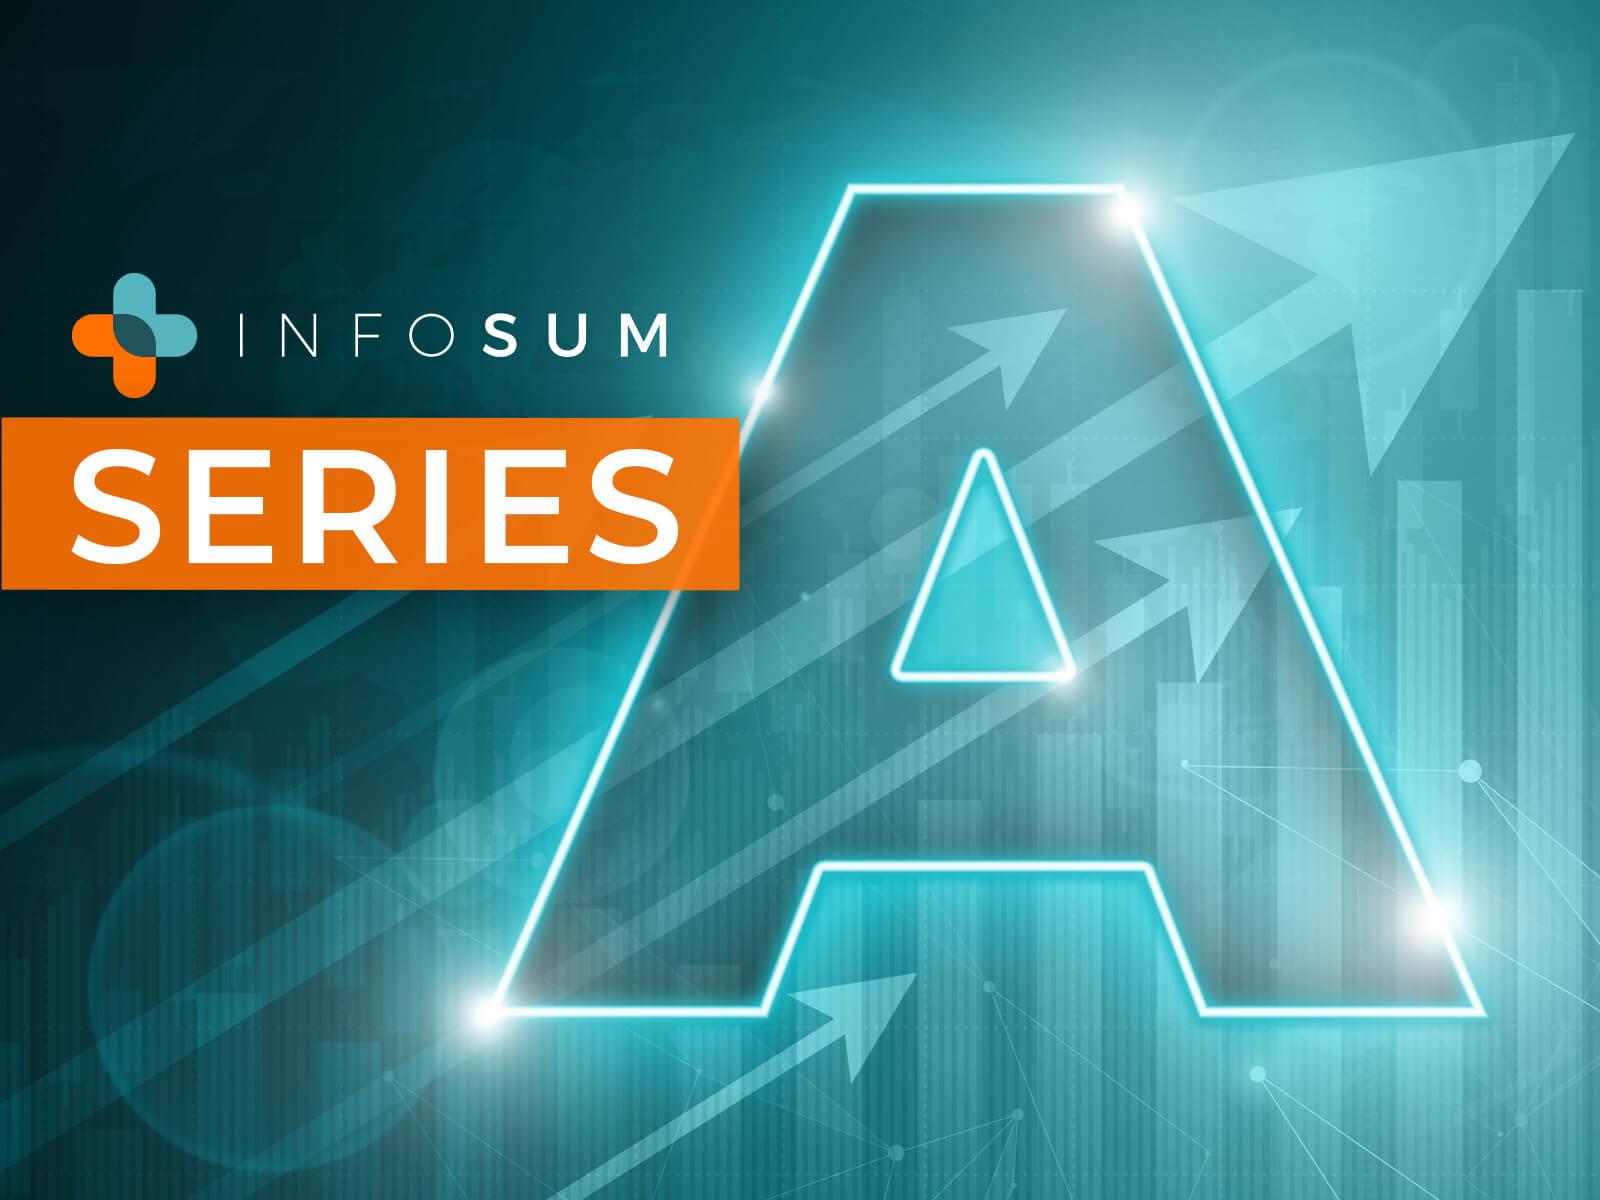 InfoSum raises $15.1 million in Series A funding